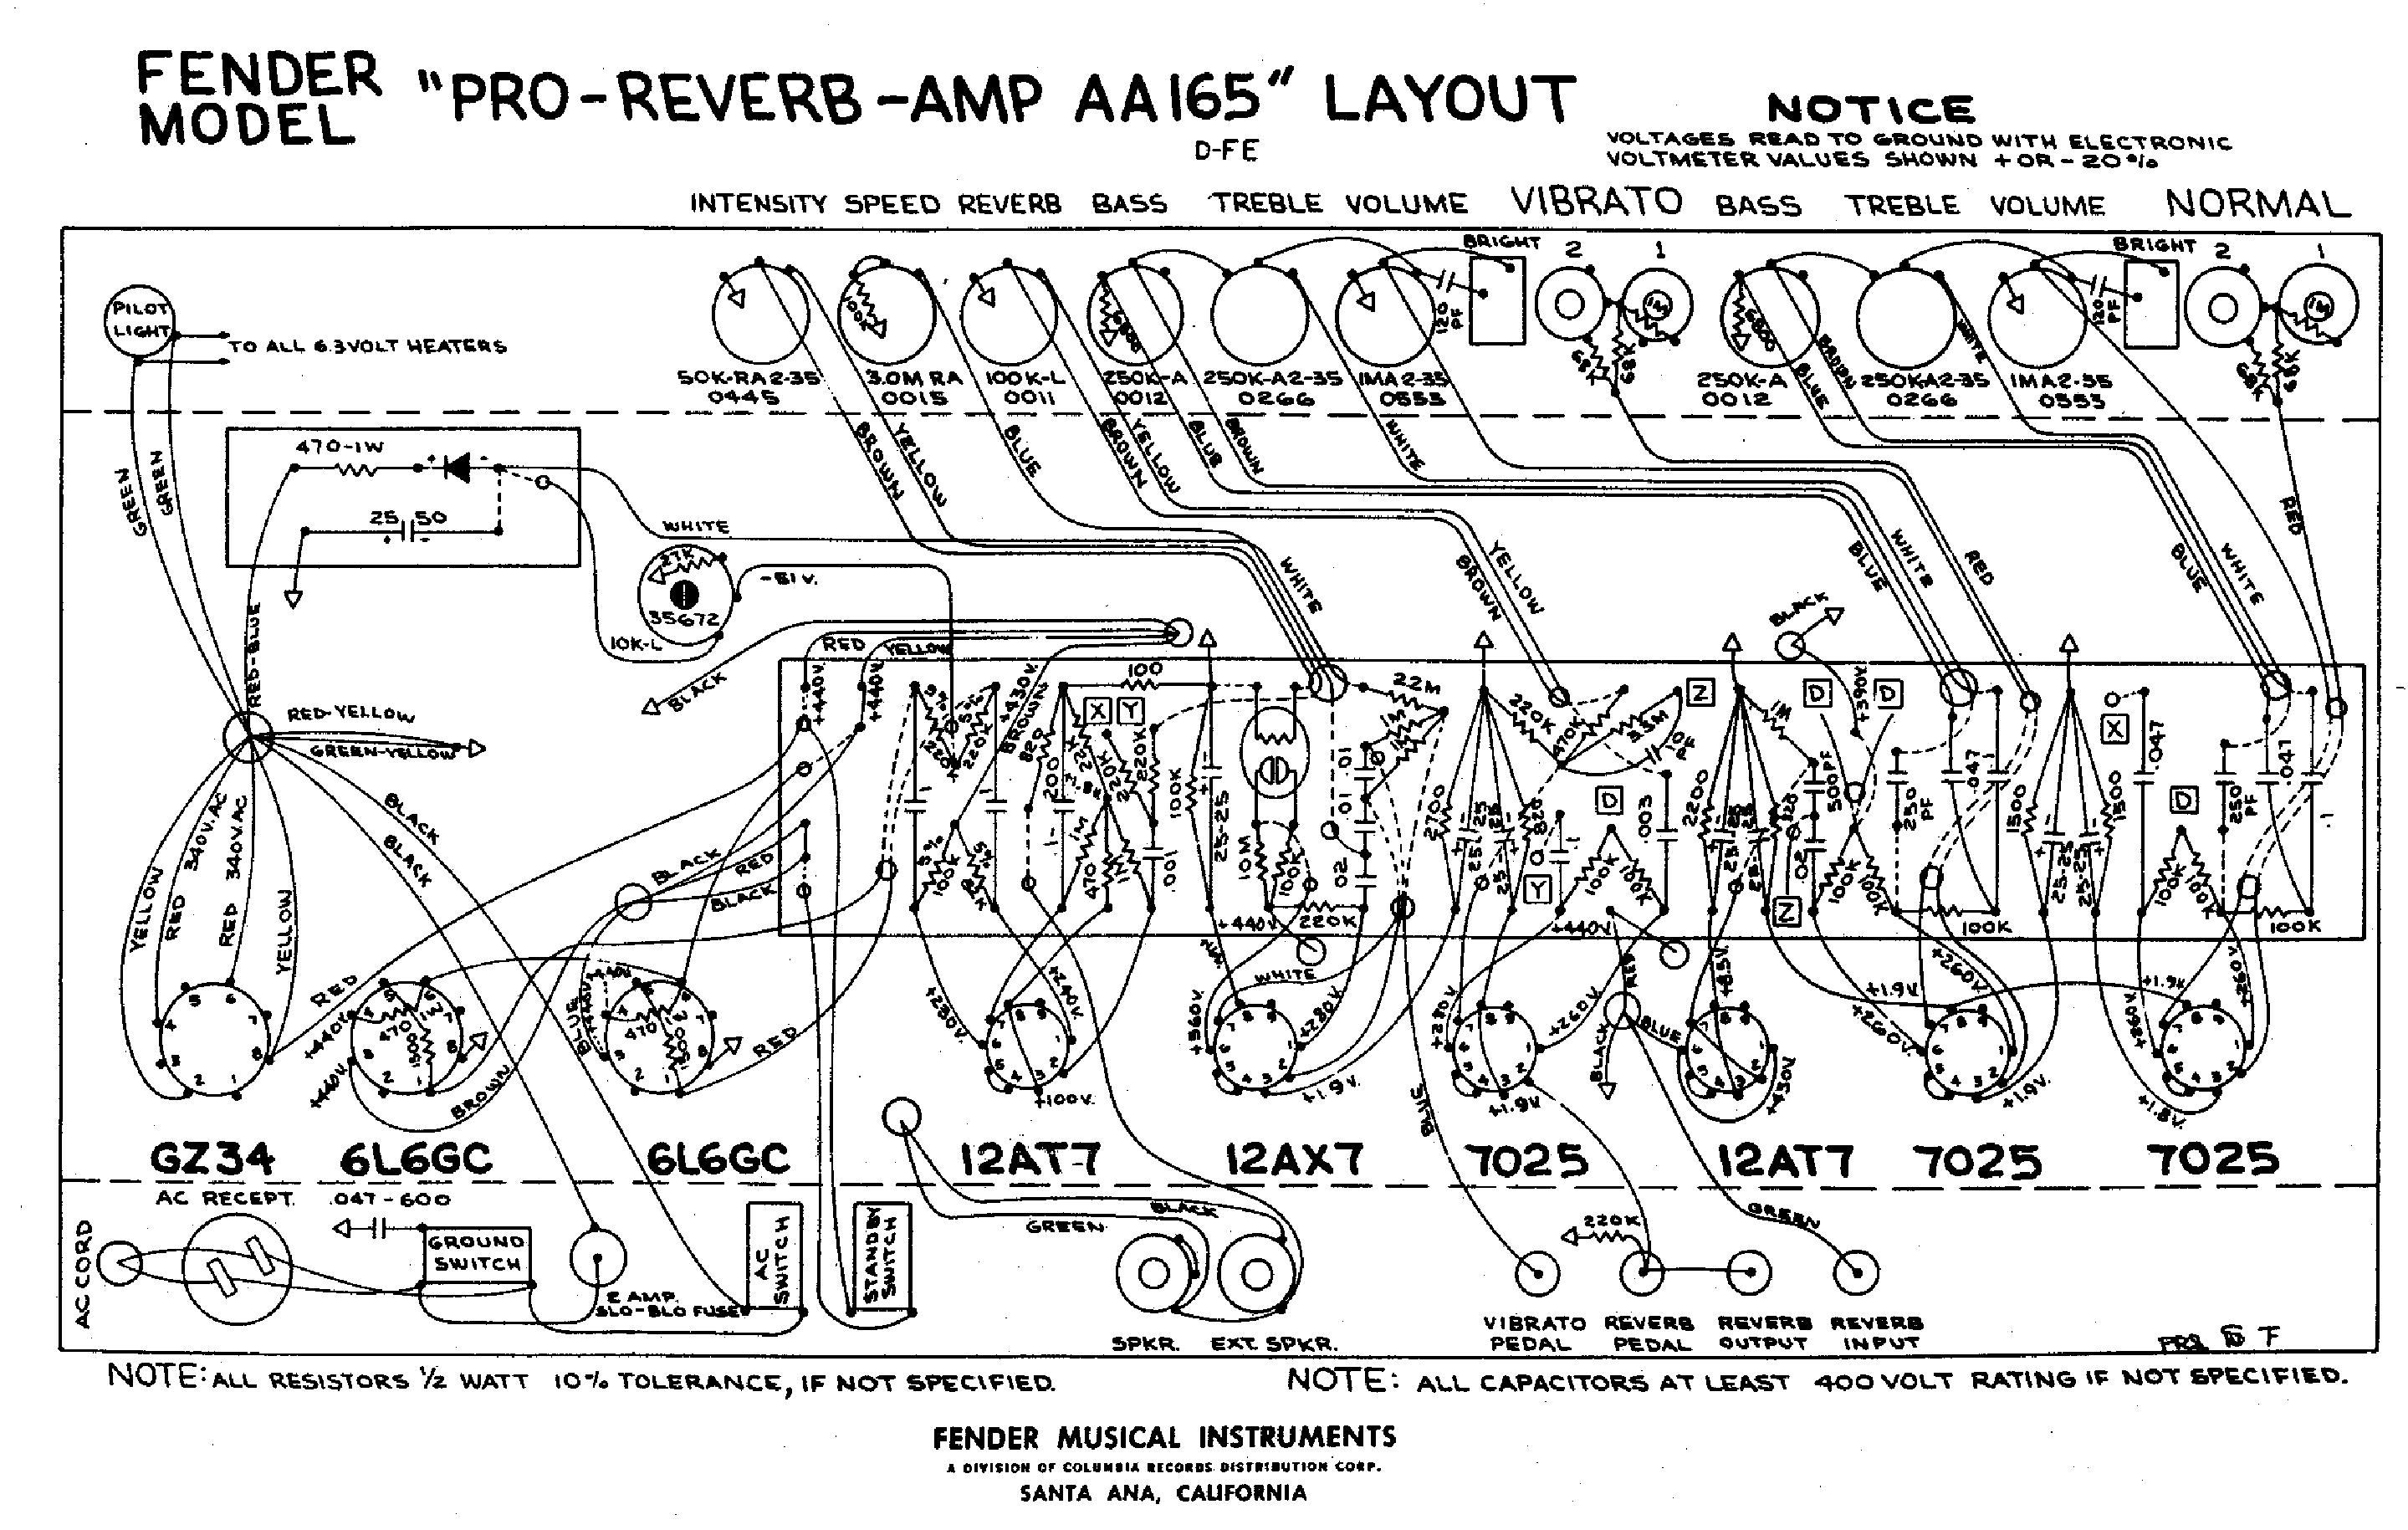 fender pro reverb schematic  | elektrotanya.com